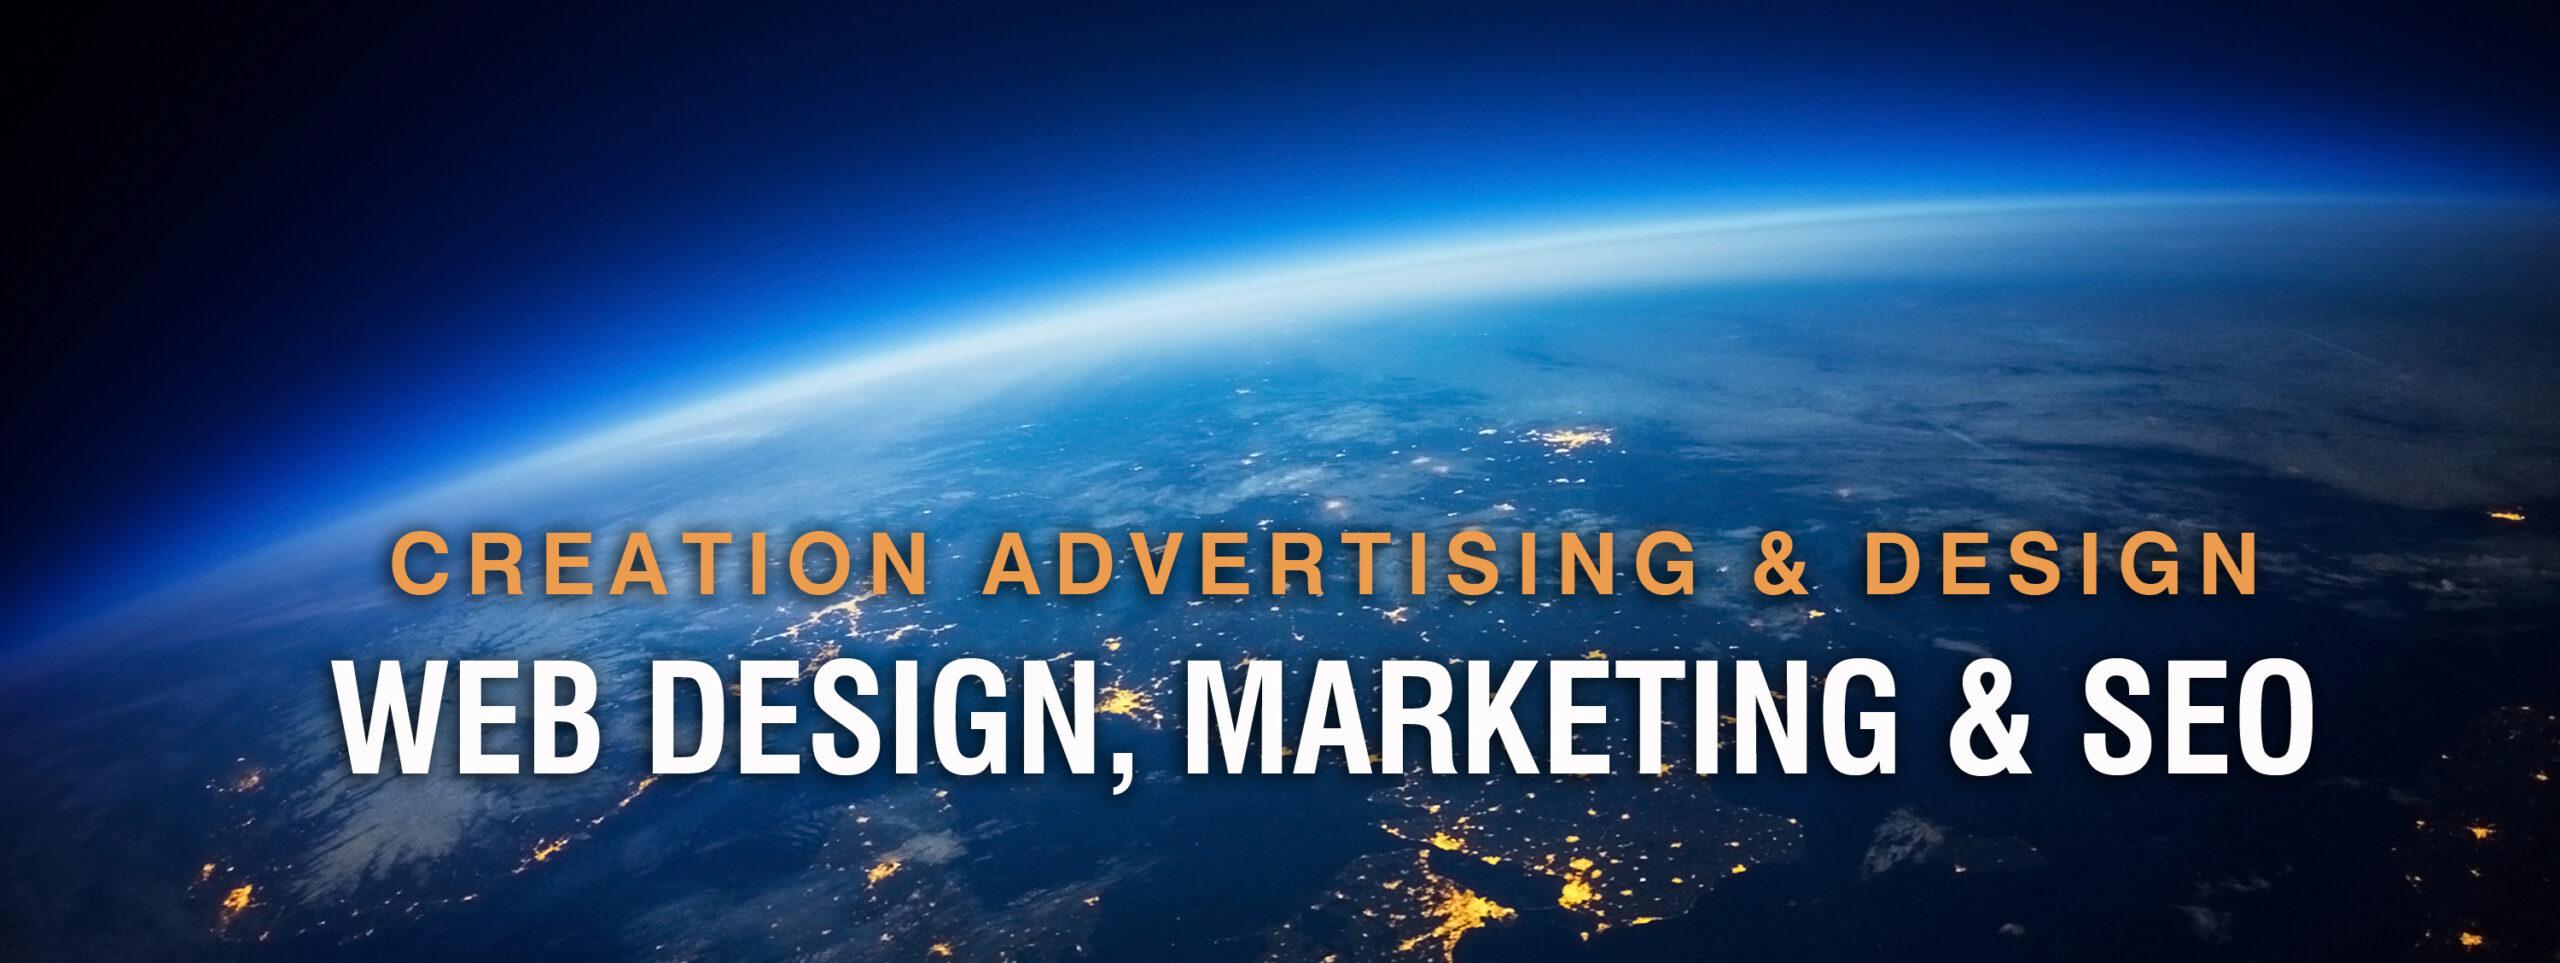 Web design, Marketing and SEO